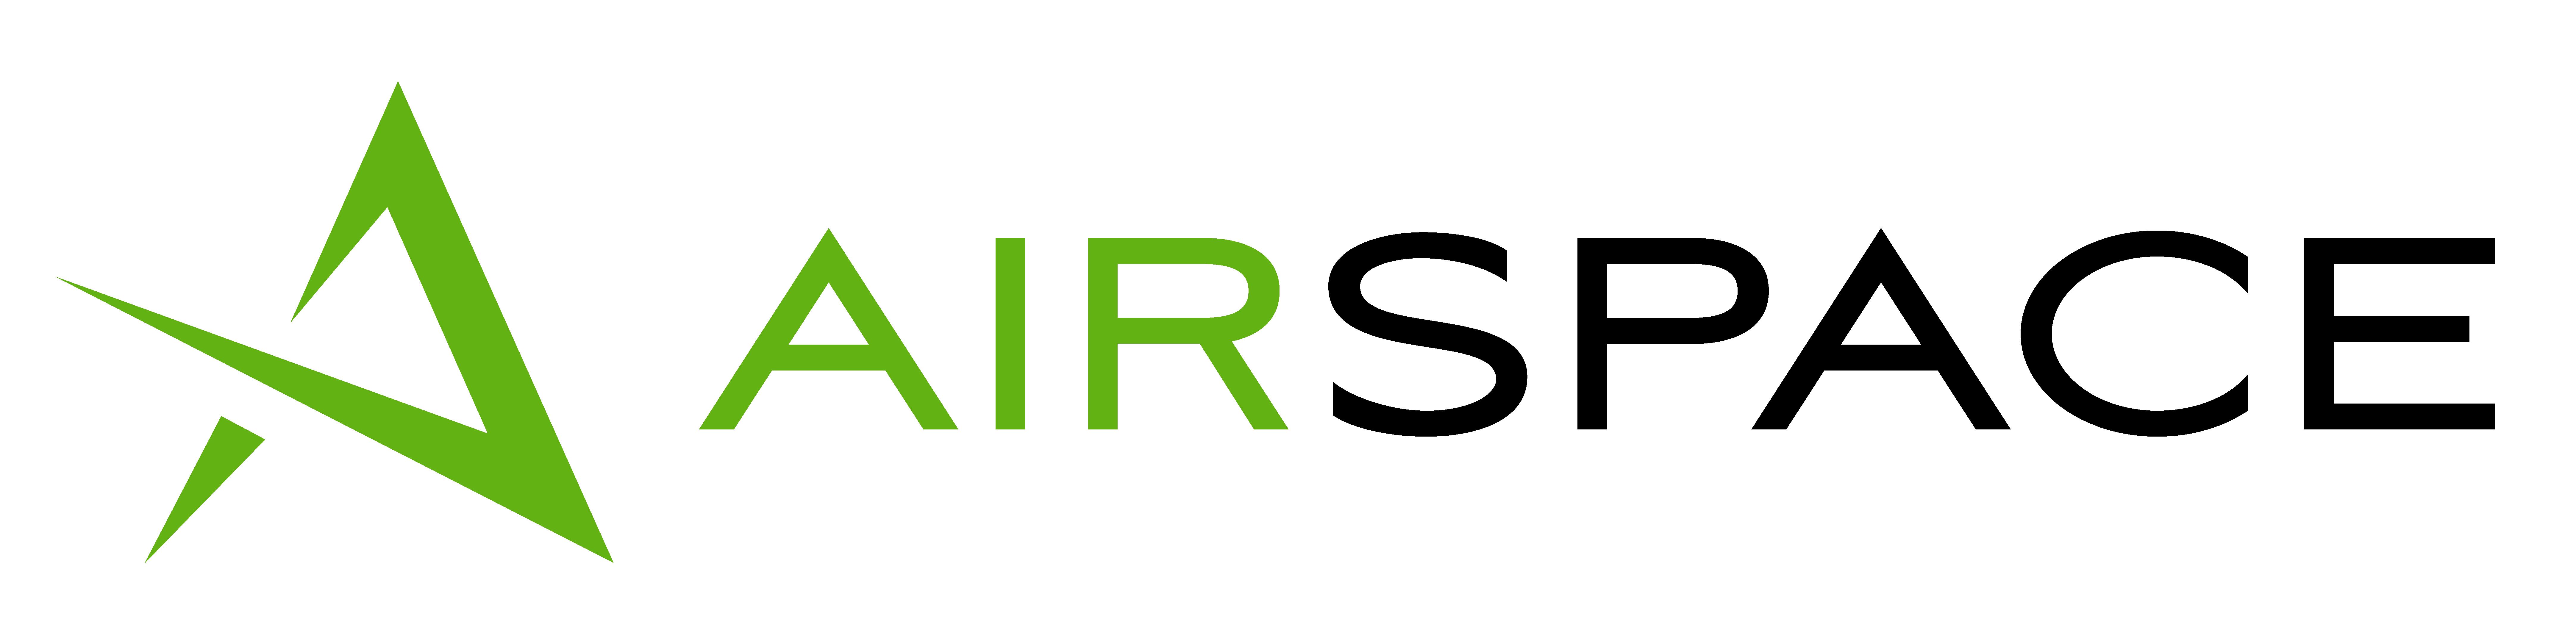 Airspace horiz-logo